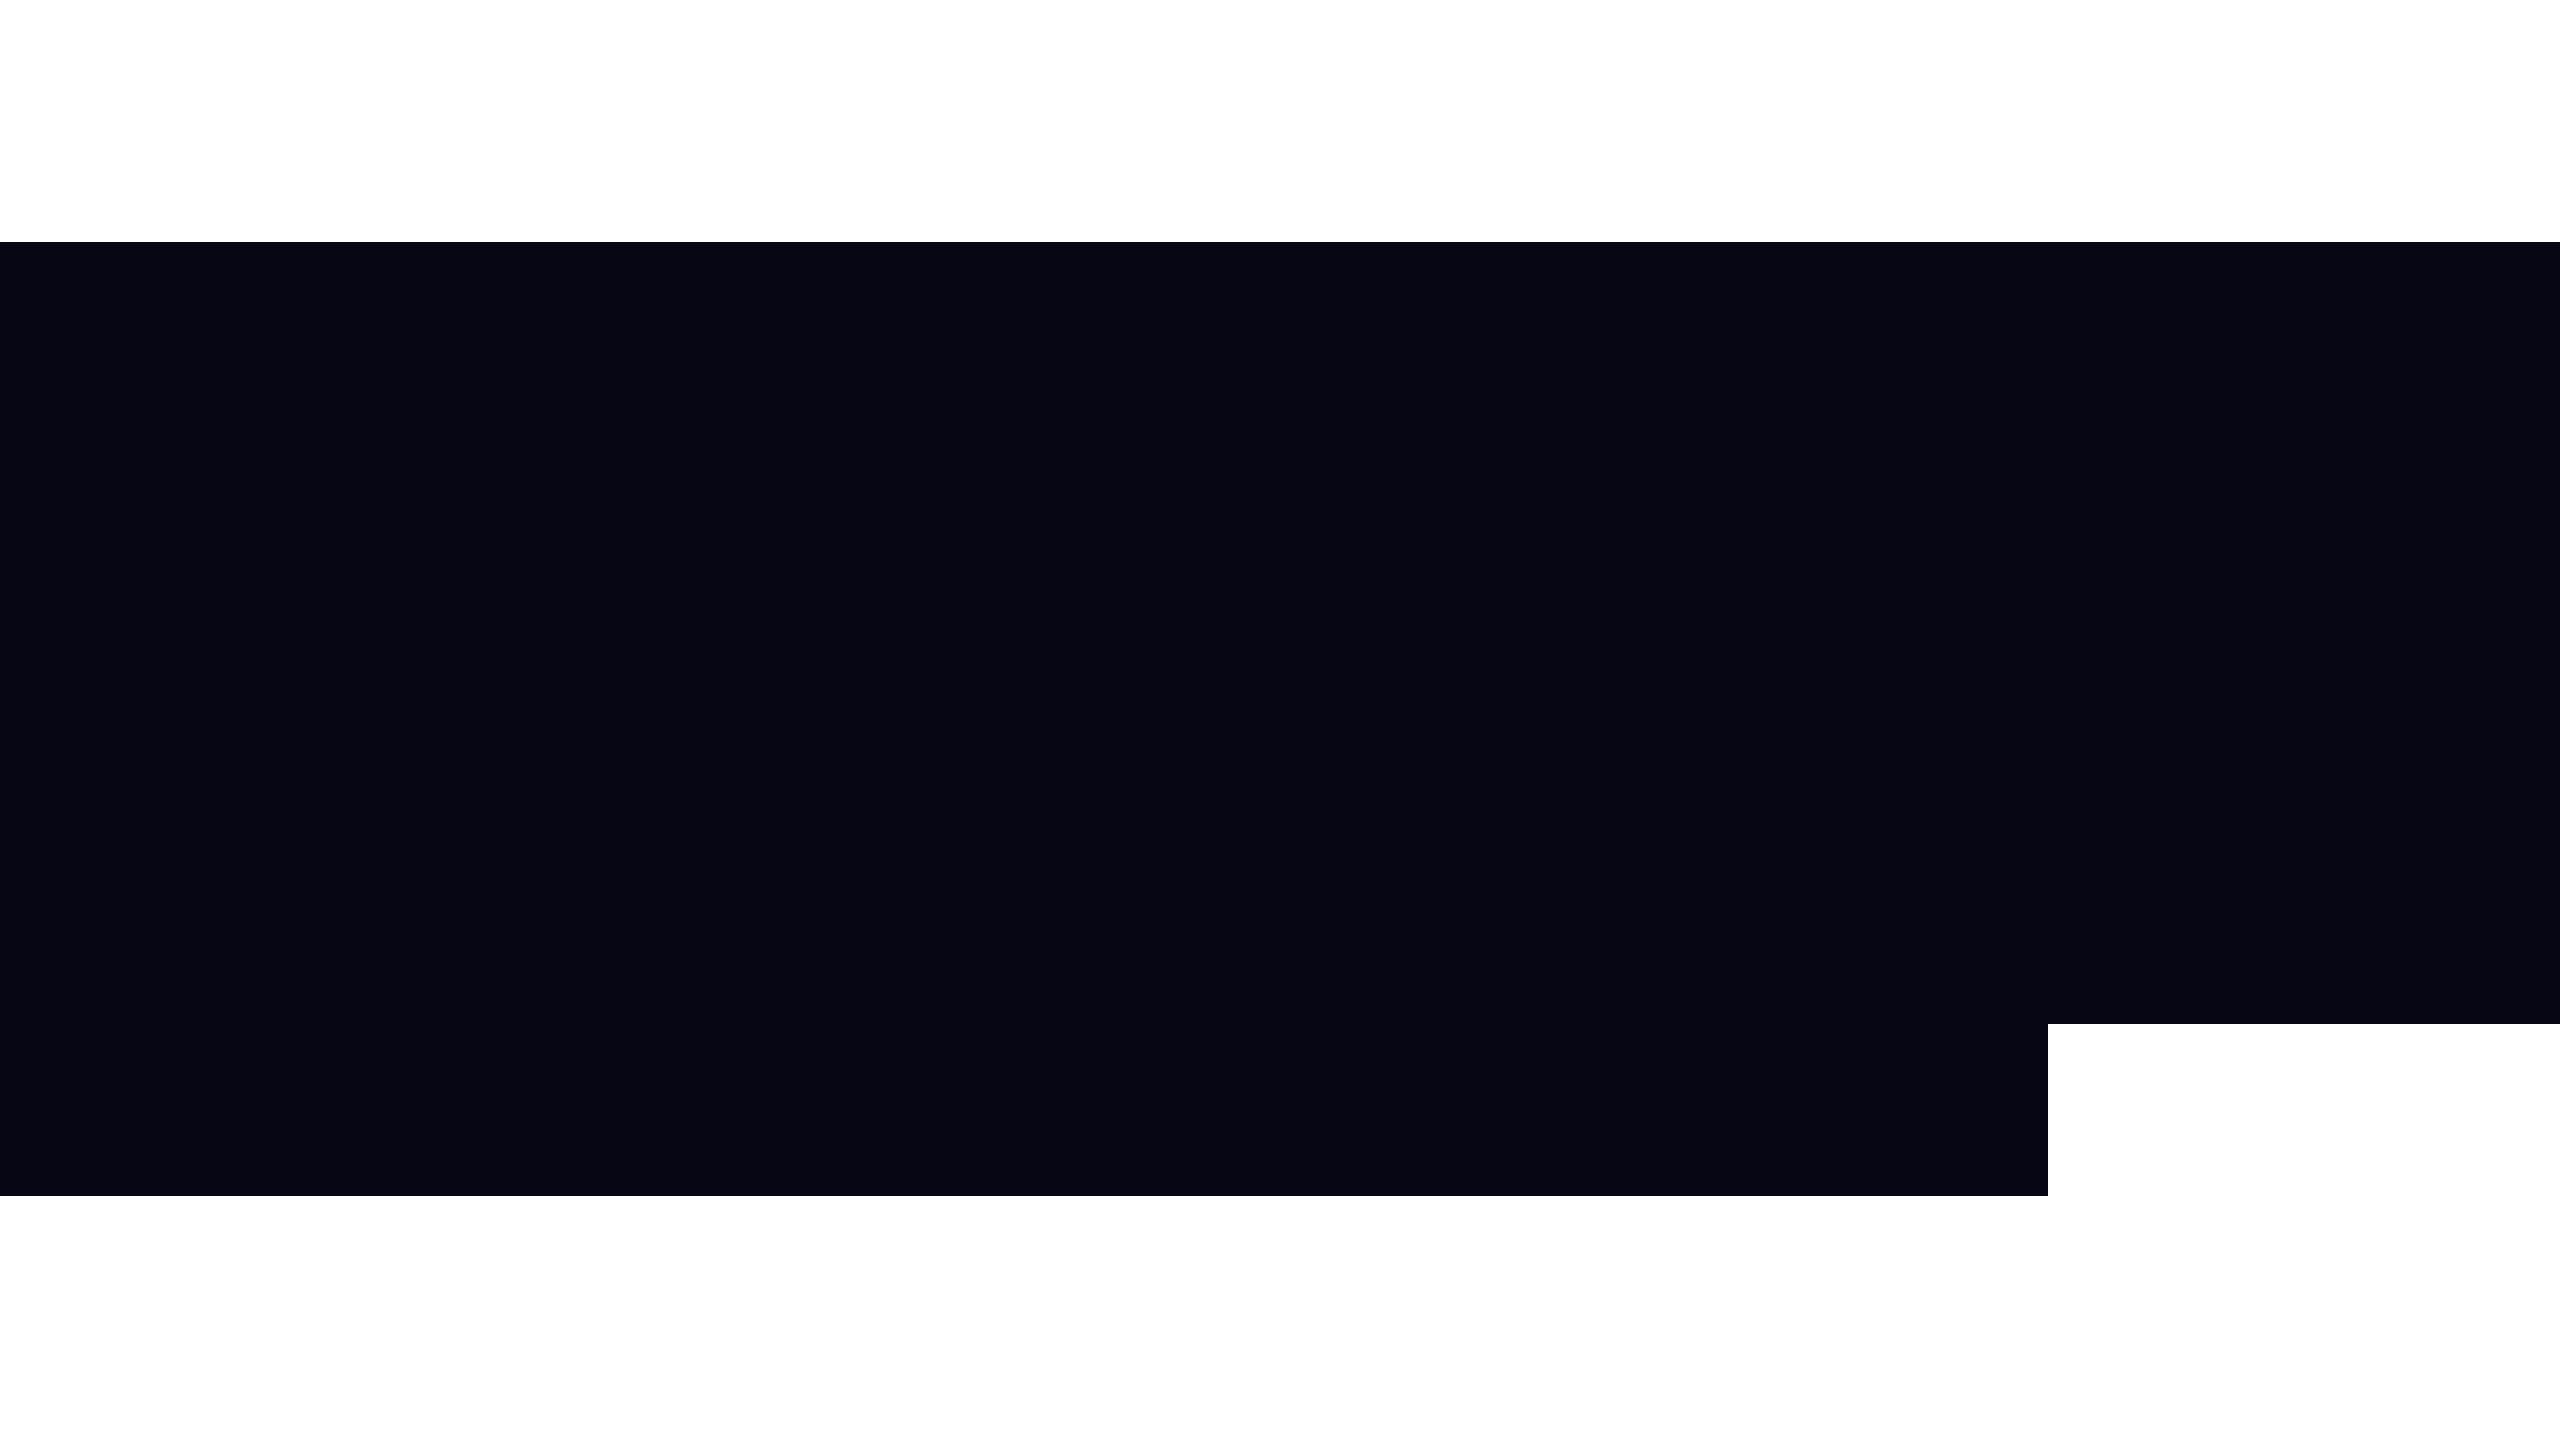 Dubmood-Main-TypeLarge